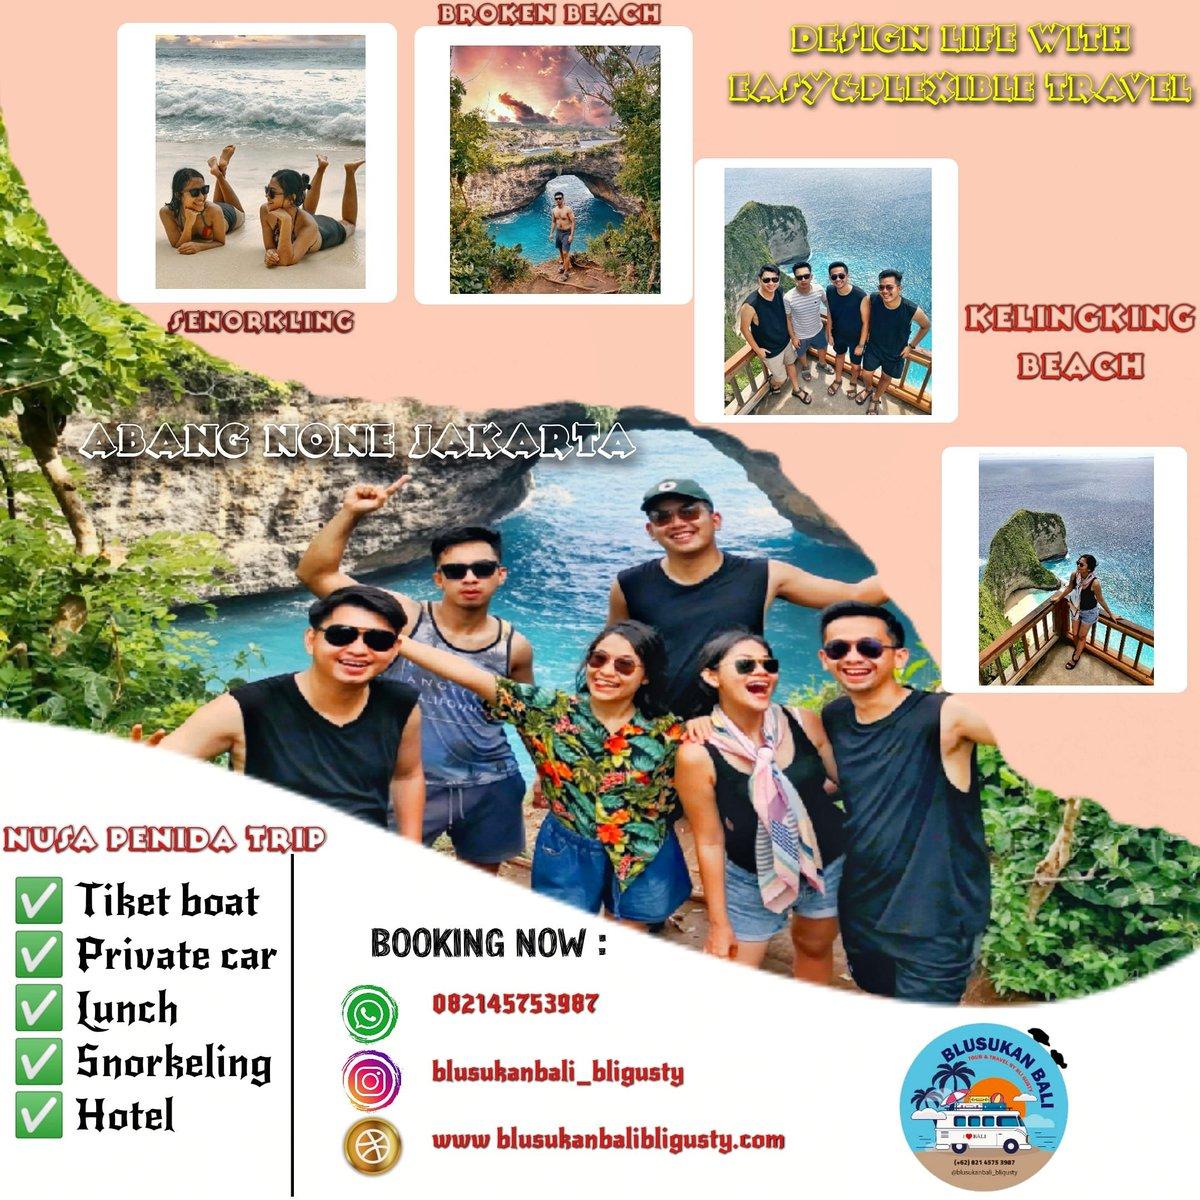 #fotografer #perjalanan #vacation #model #travelling #beach #likeforlikes #lifestyle #life #india #sunset #beauty #hiburan #smile #me #traveltheworld #myself #instalike #mountains #followme #photoshoot #sea #music #tourism #italy #traveler #portrait #europe #traveller #fun